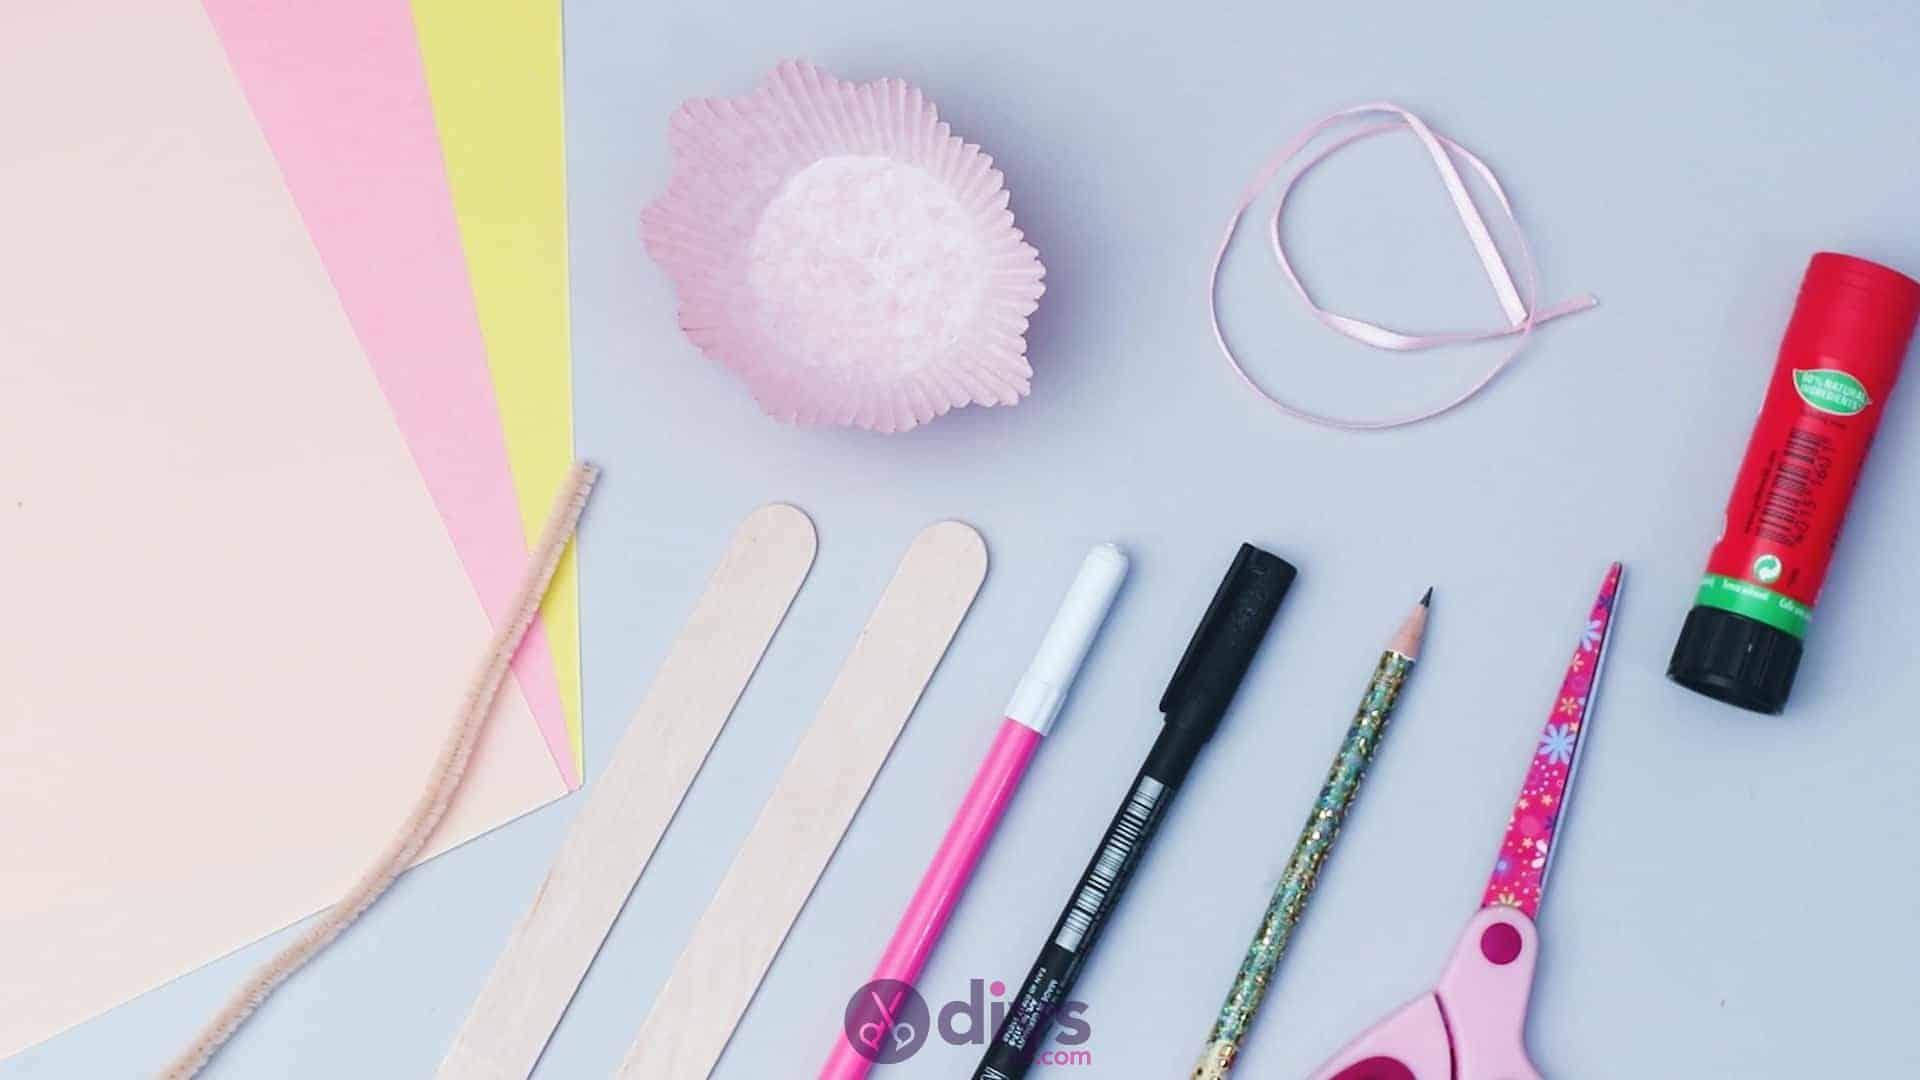 Cupcake liner ballerina materials